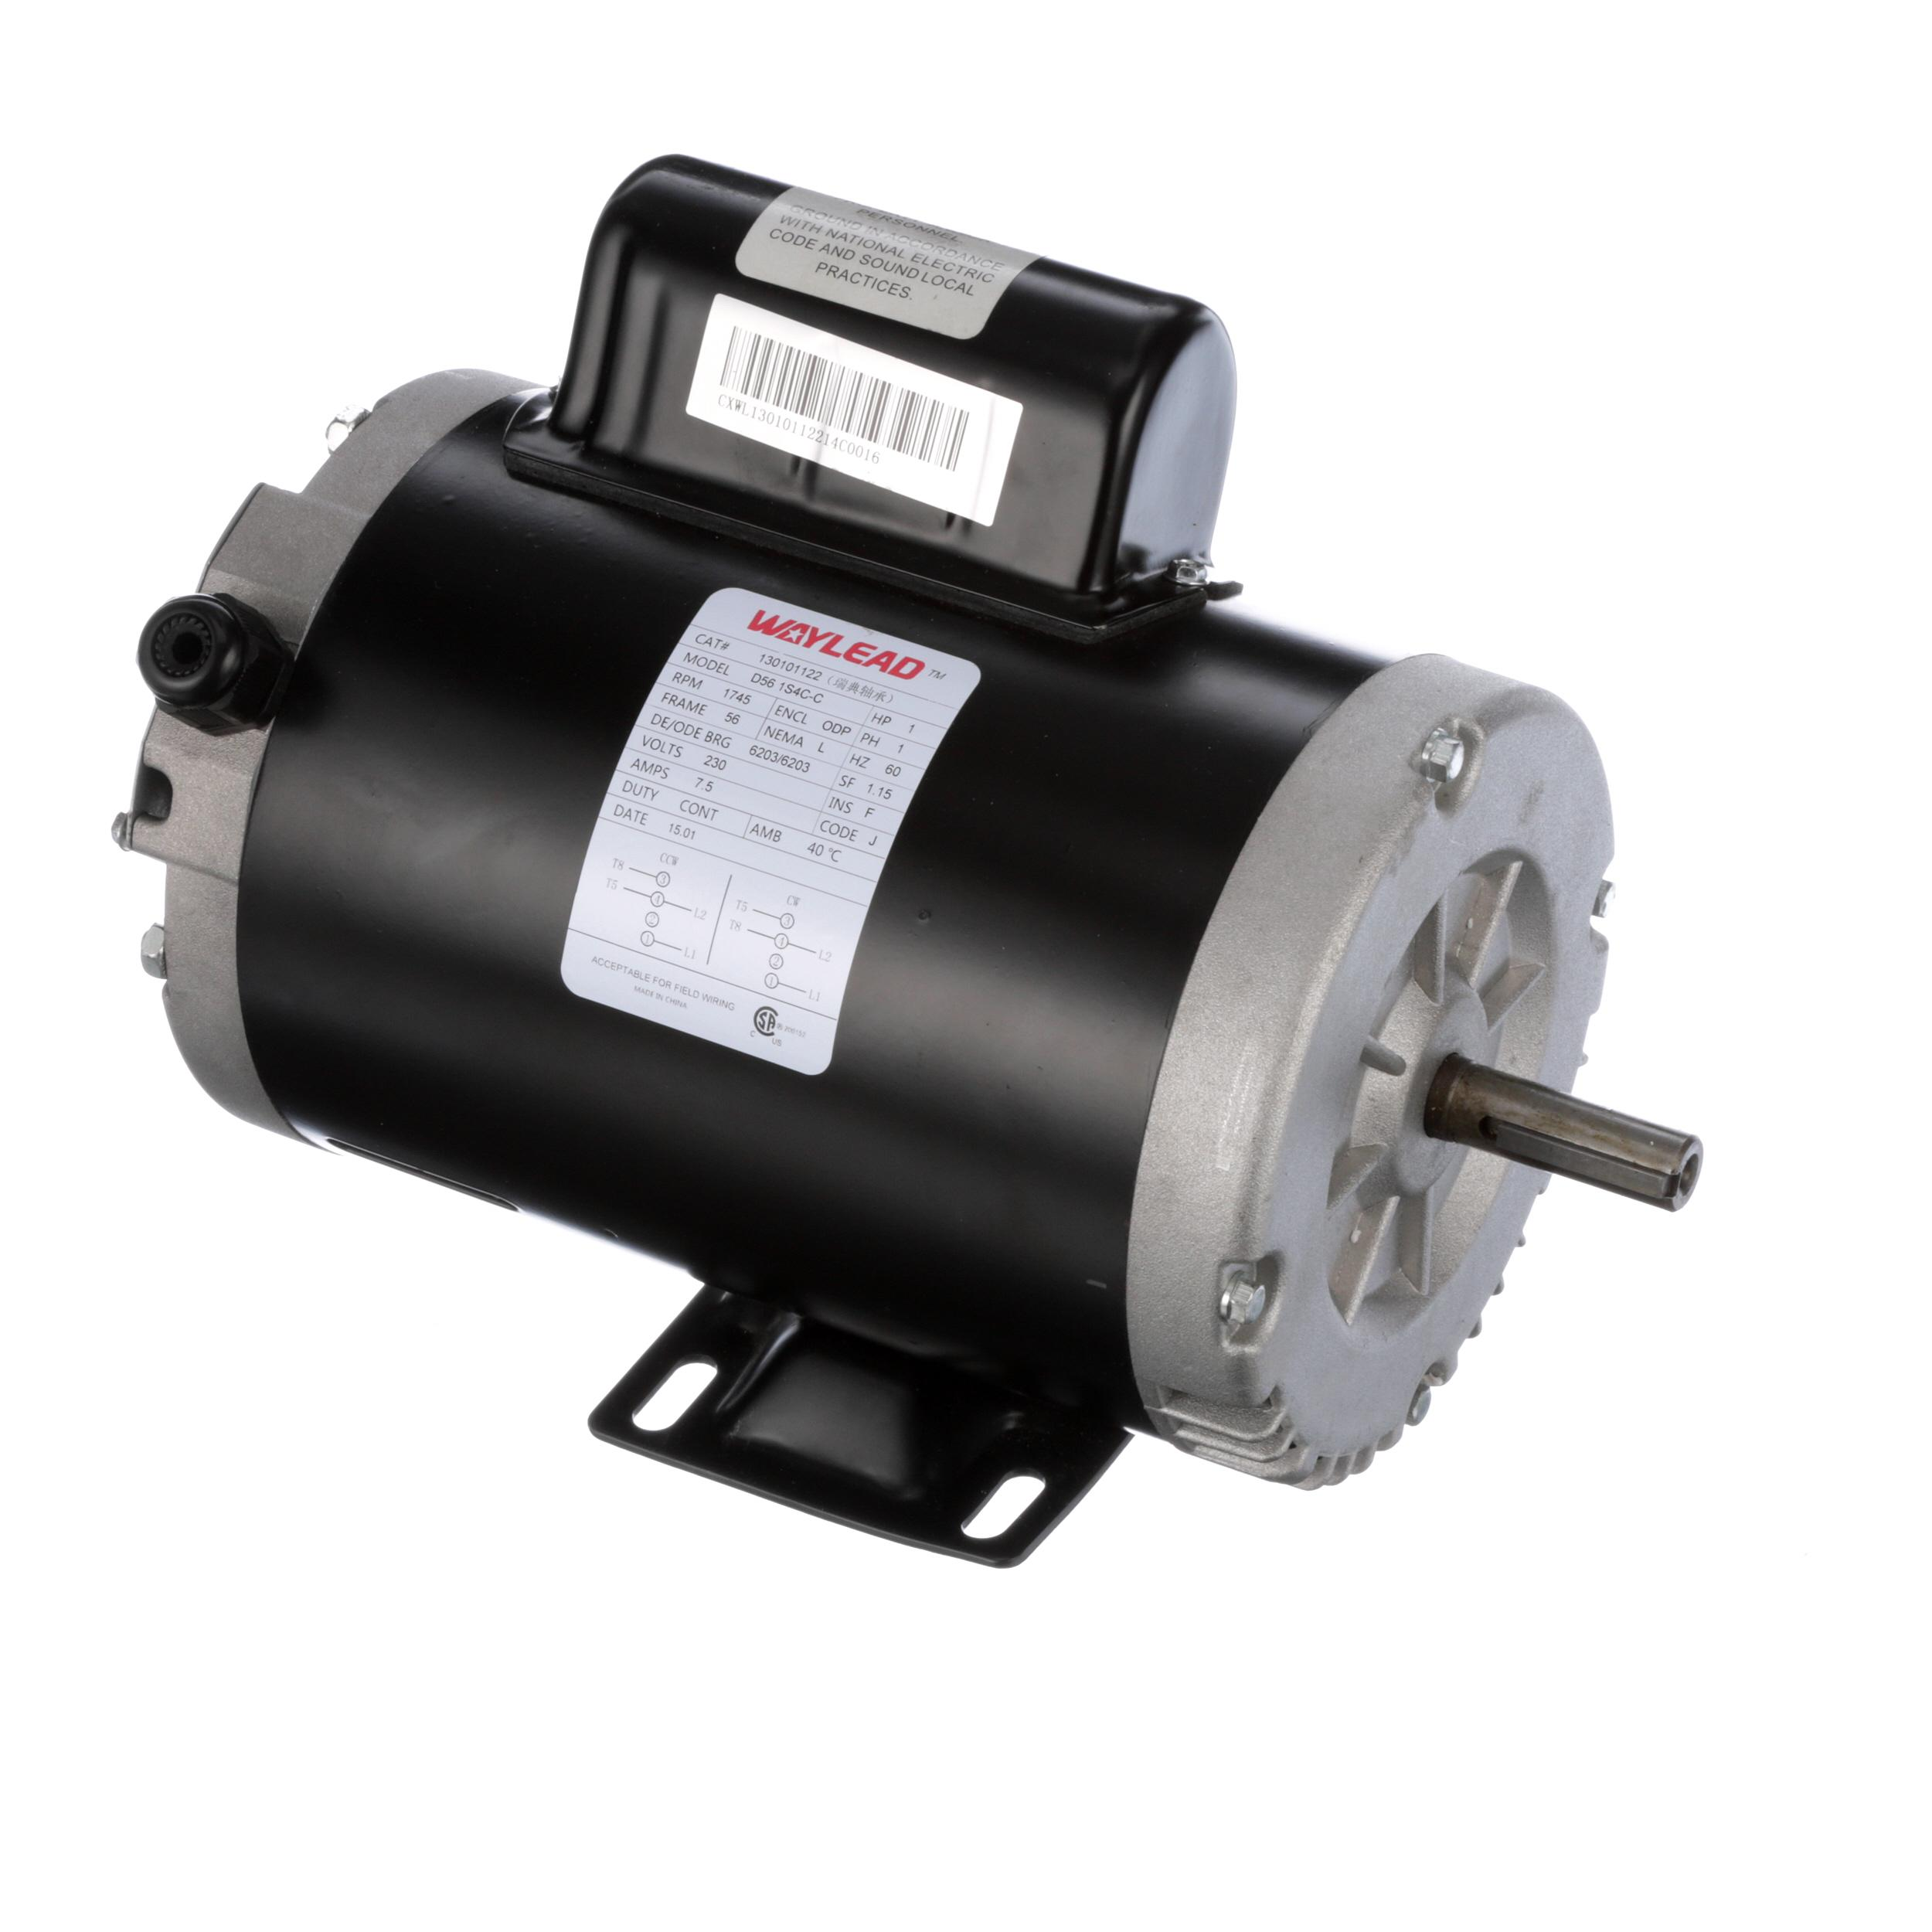 Donper usa beater motor 230v 60hz part 130101122 for Motor manufacturers in usa